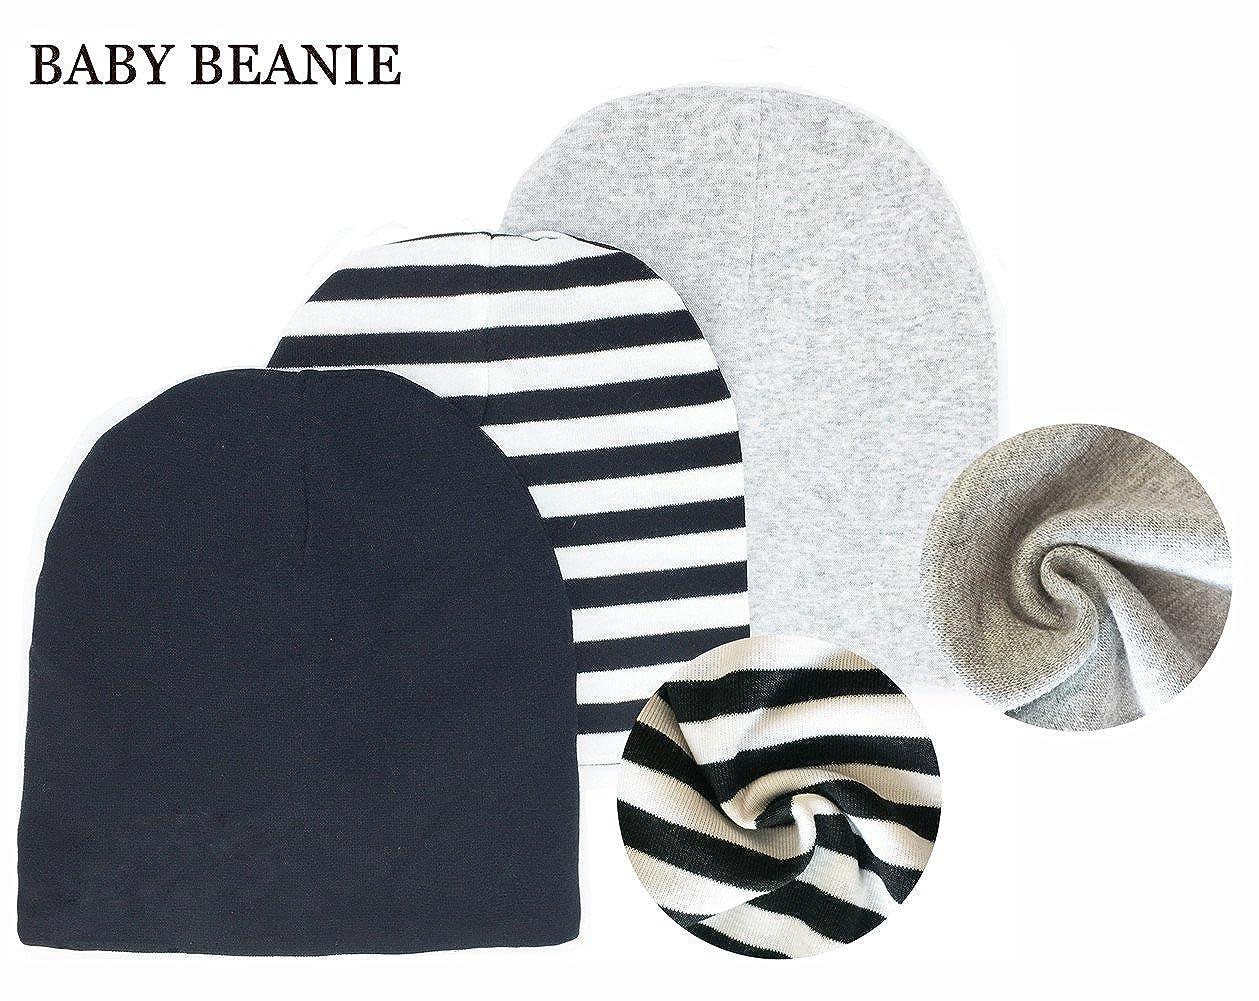 Miyarooma Kids Beanie Hat Soft Adjustable Cool Boy Cute Girl Cotton Toddler Knit Hat Cap